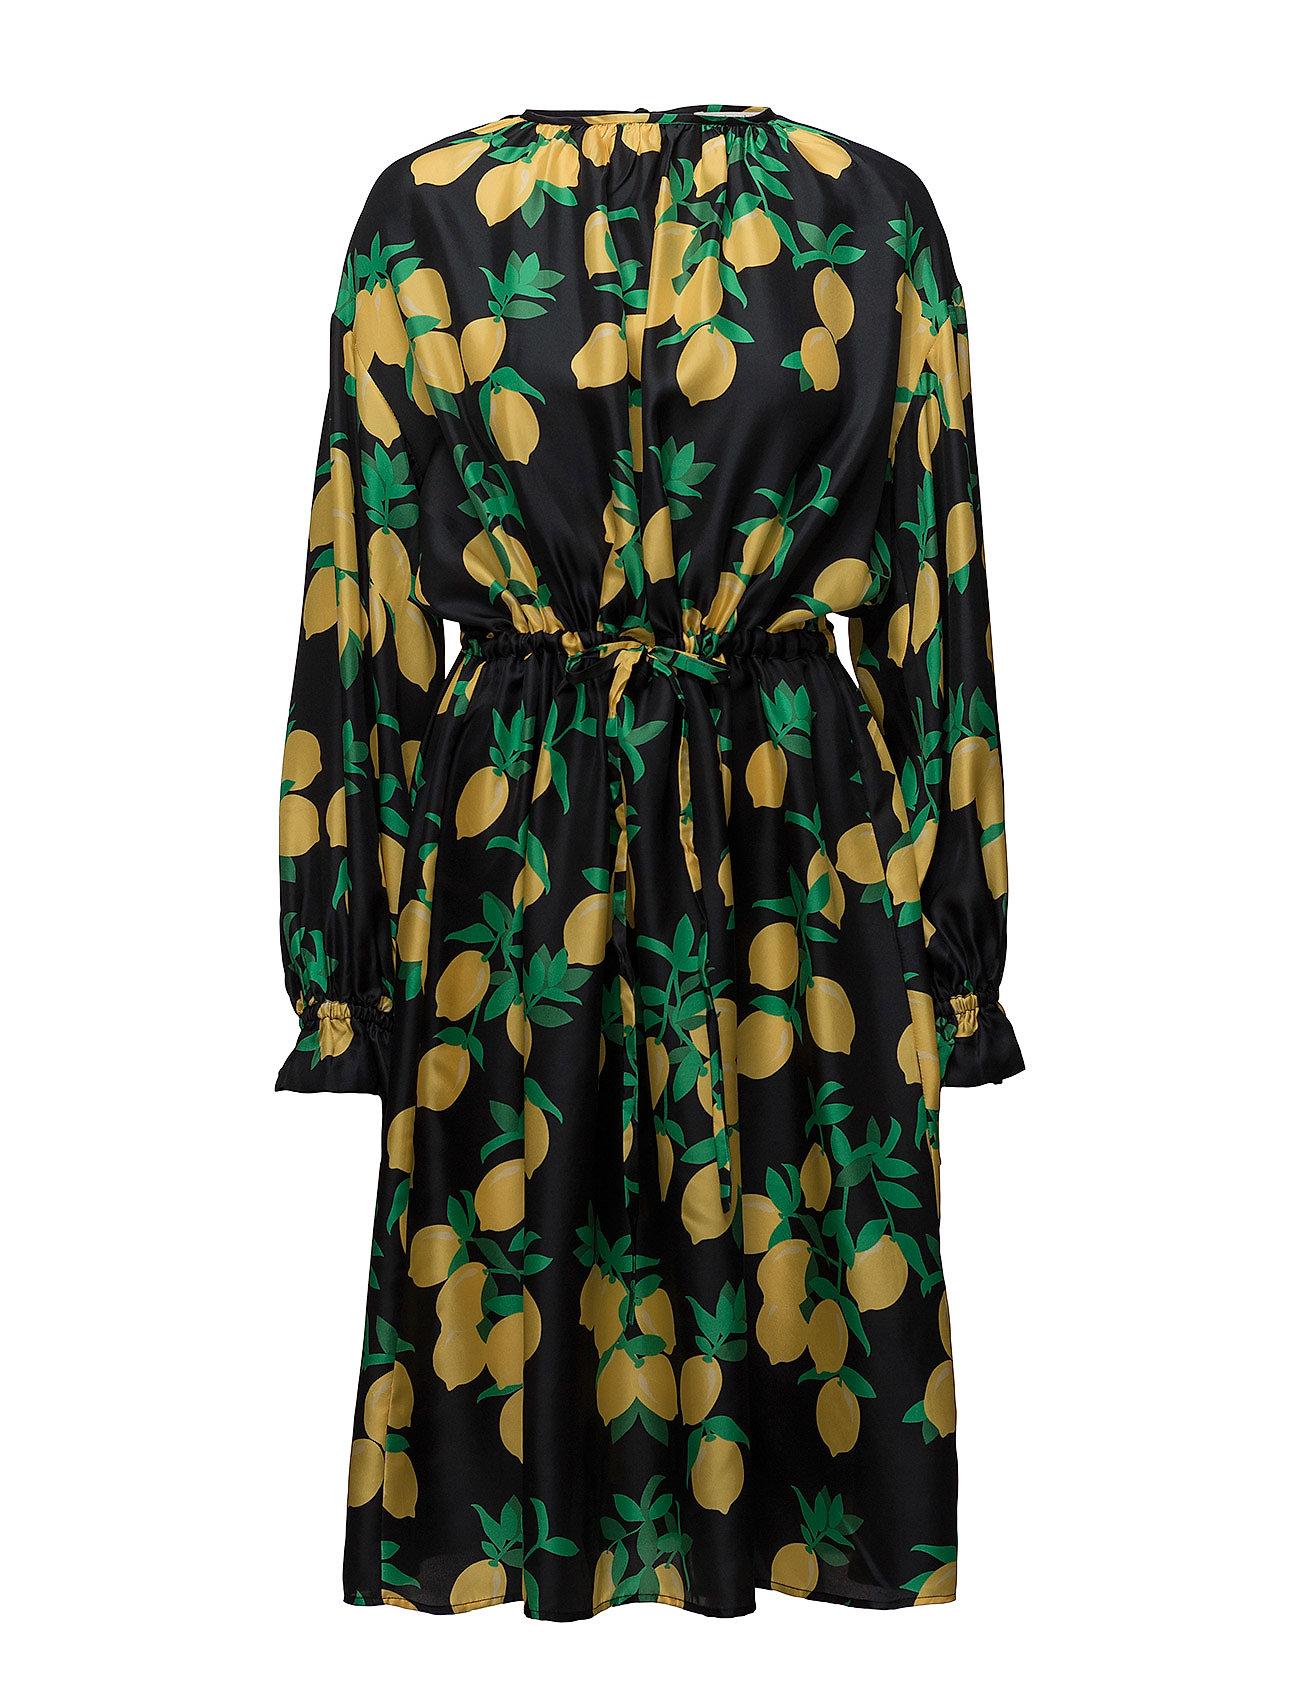 Lovechild 1979 Wilma Dress